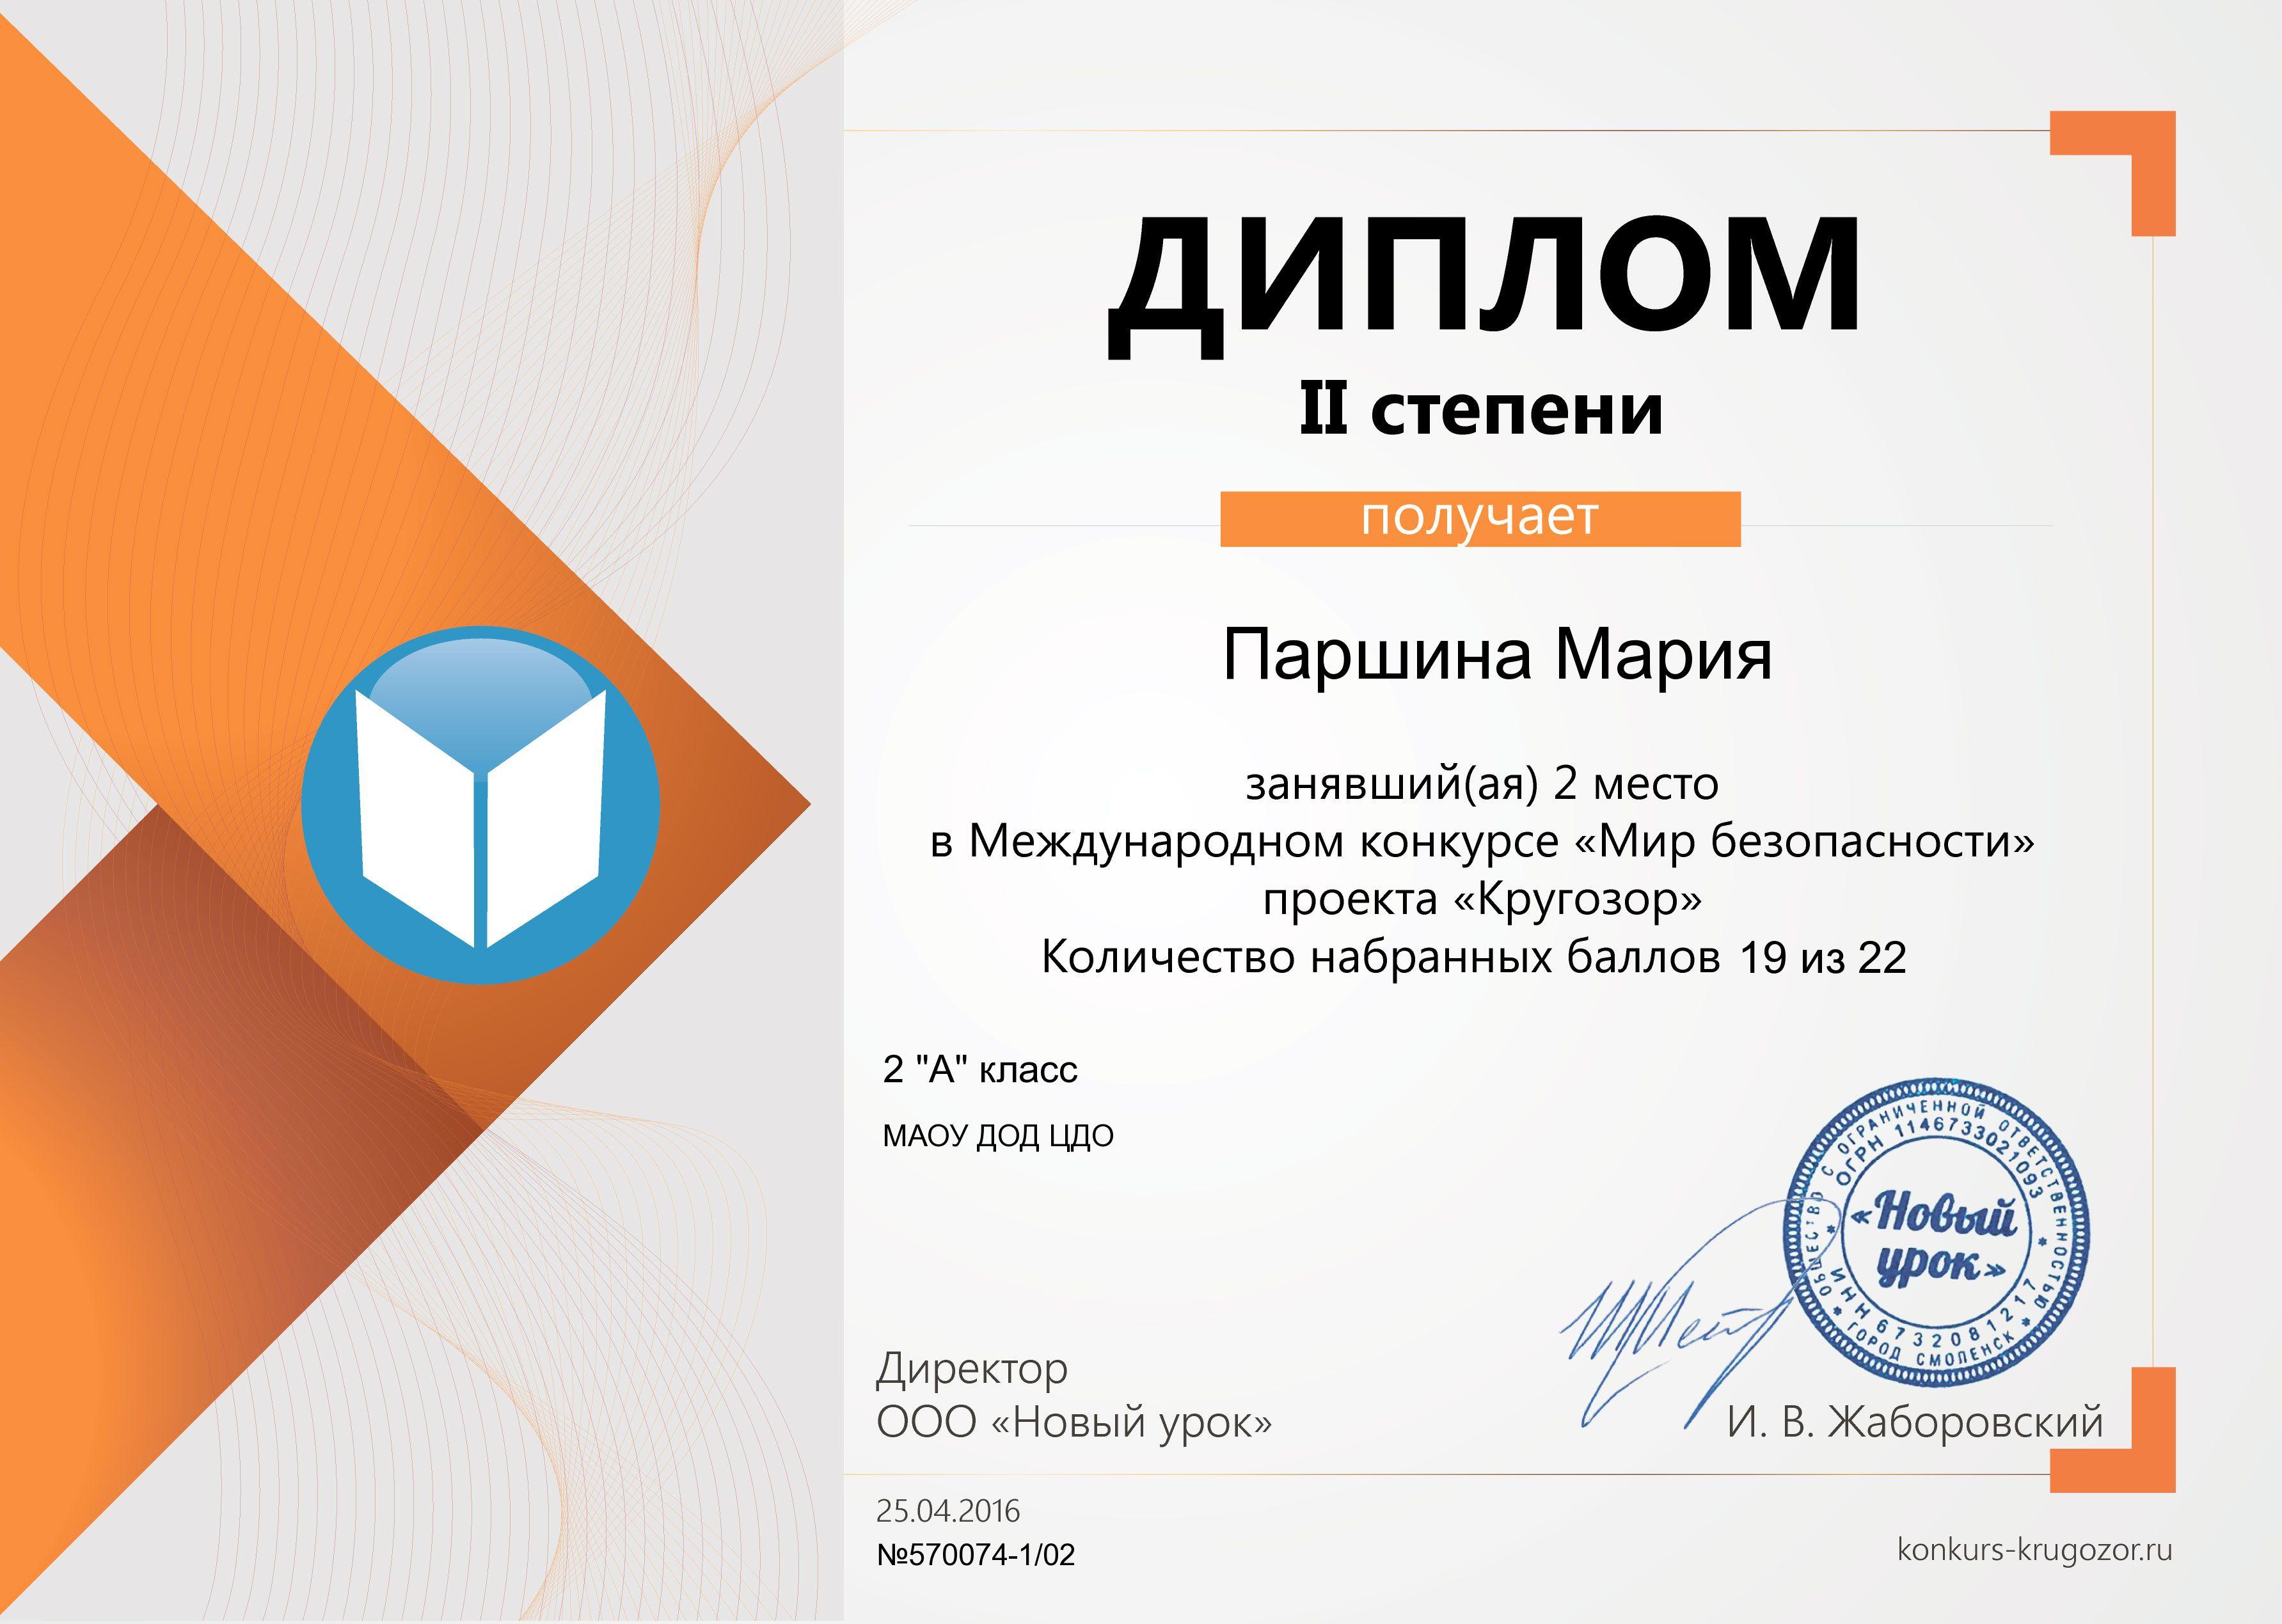 krugozor_format_A4_document_185874